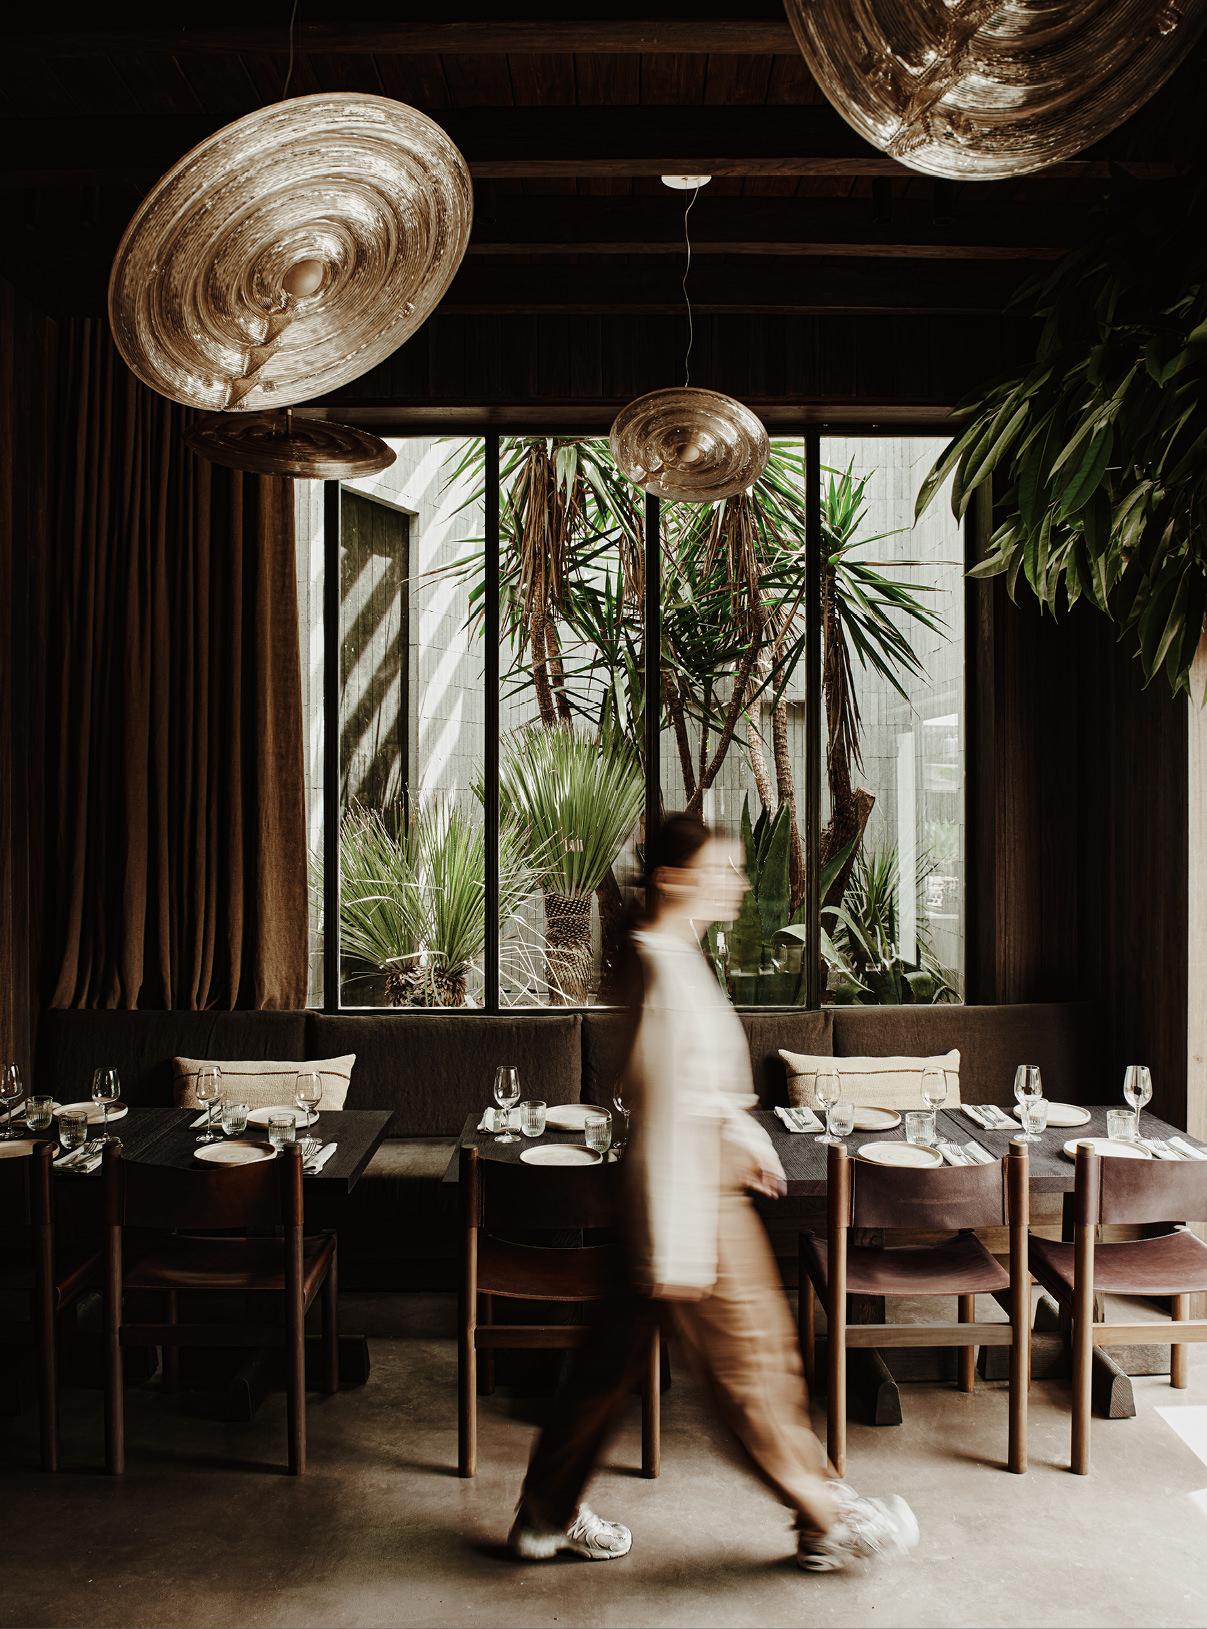 Noema Restaurant & Bar Mykonos designed by Lambs and Lions Berlin, Interior design Salon